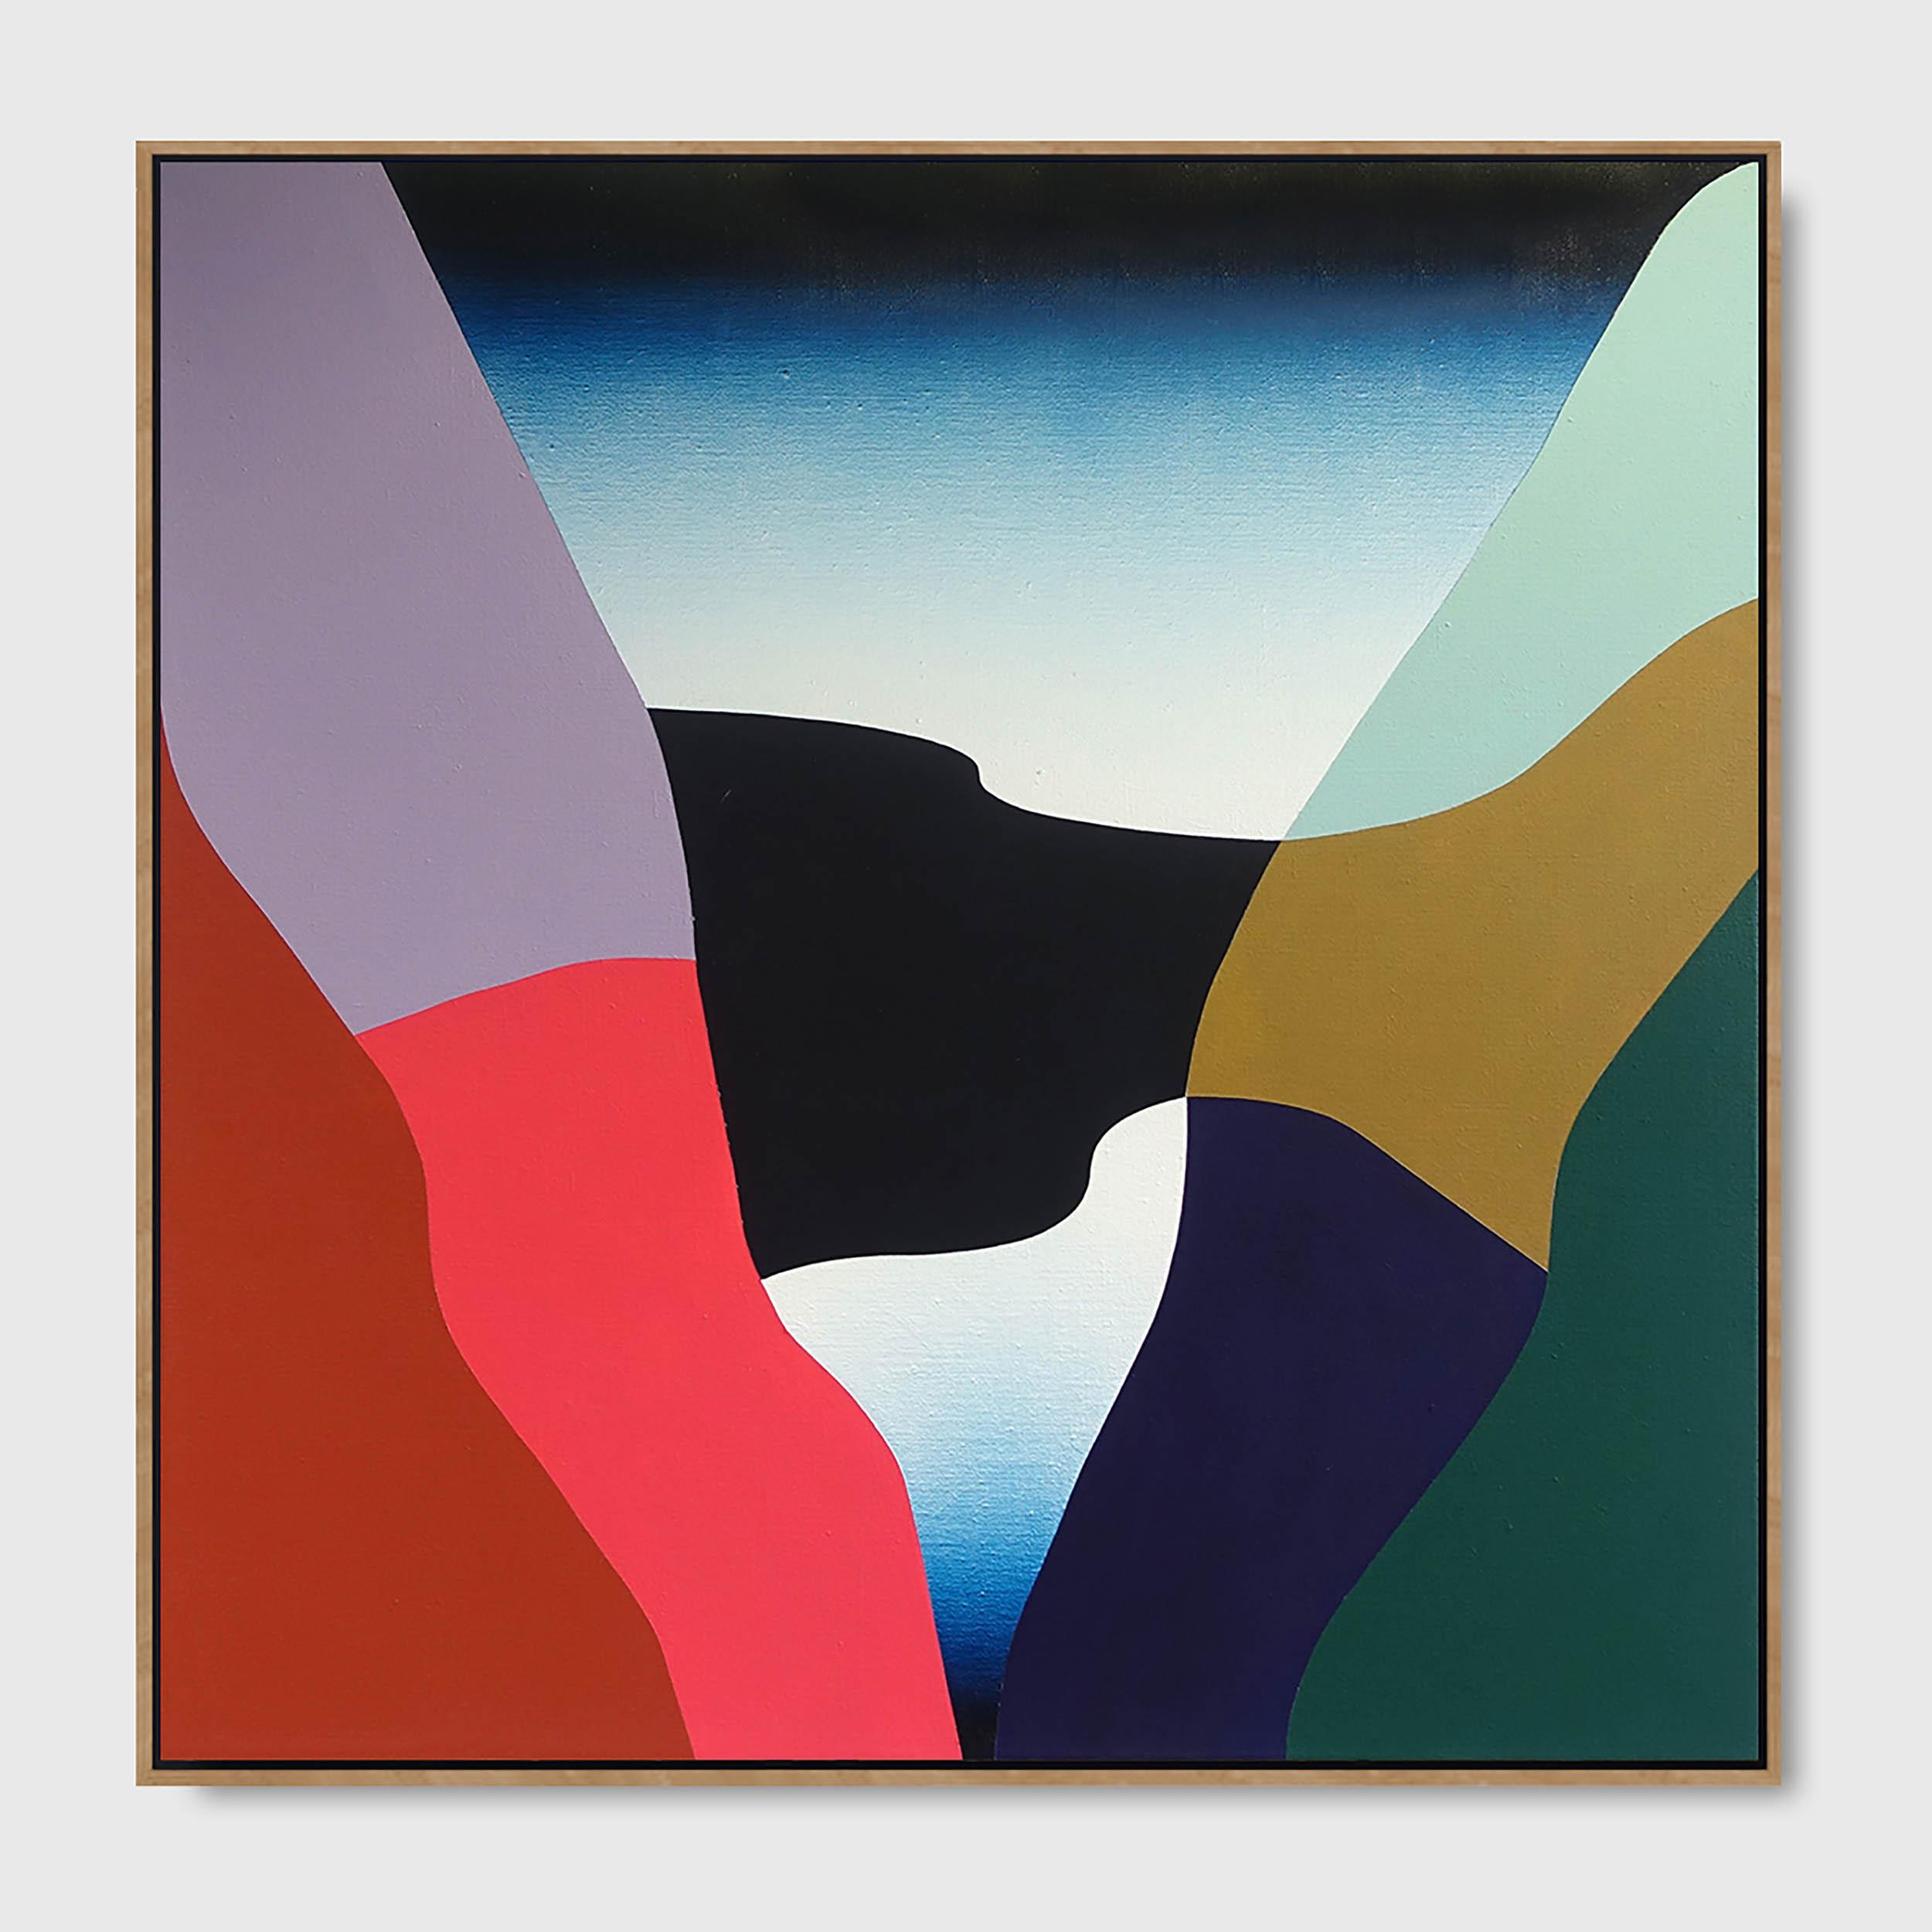 Kasei Valles - Sam Smyth - web.jpg